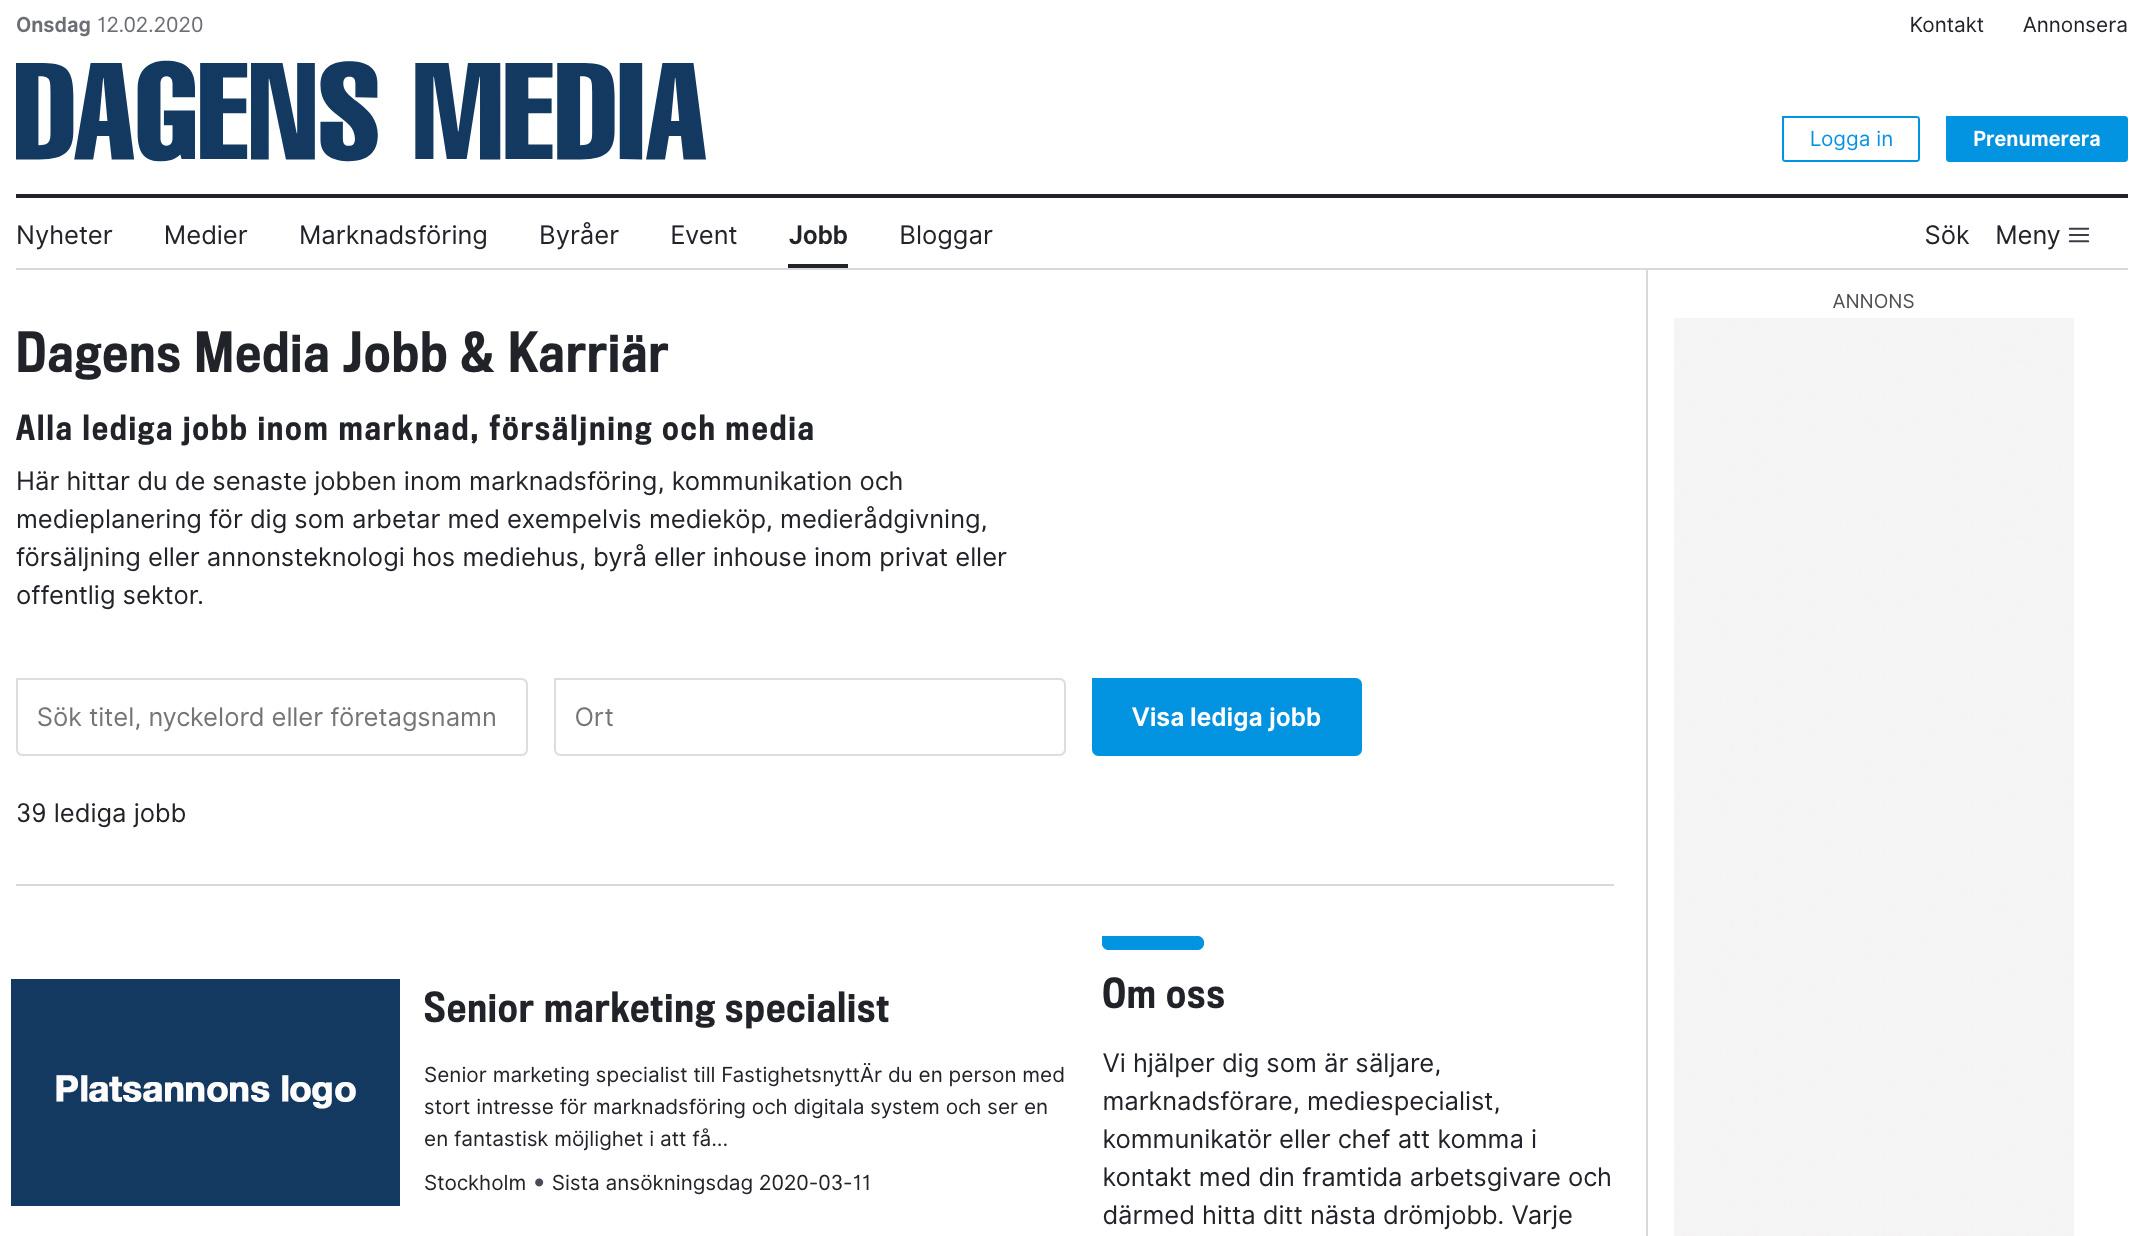 Webbannons & Sociala medier